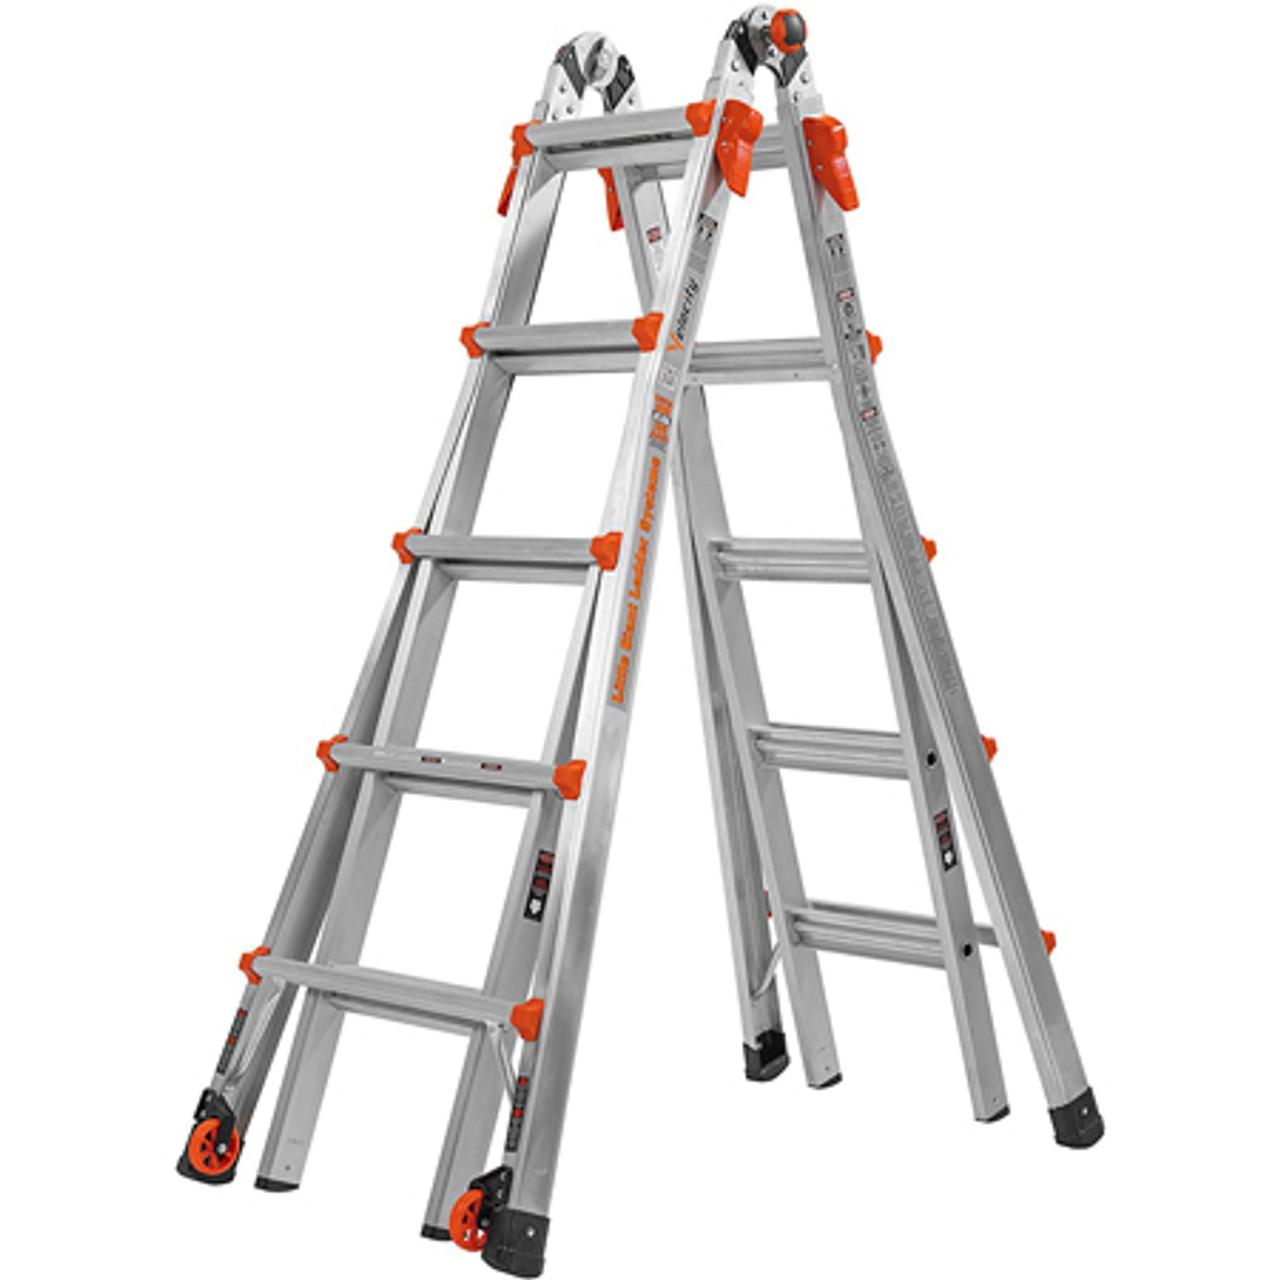 Little Giant - Multi-purpose Ladders